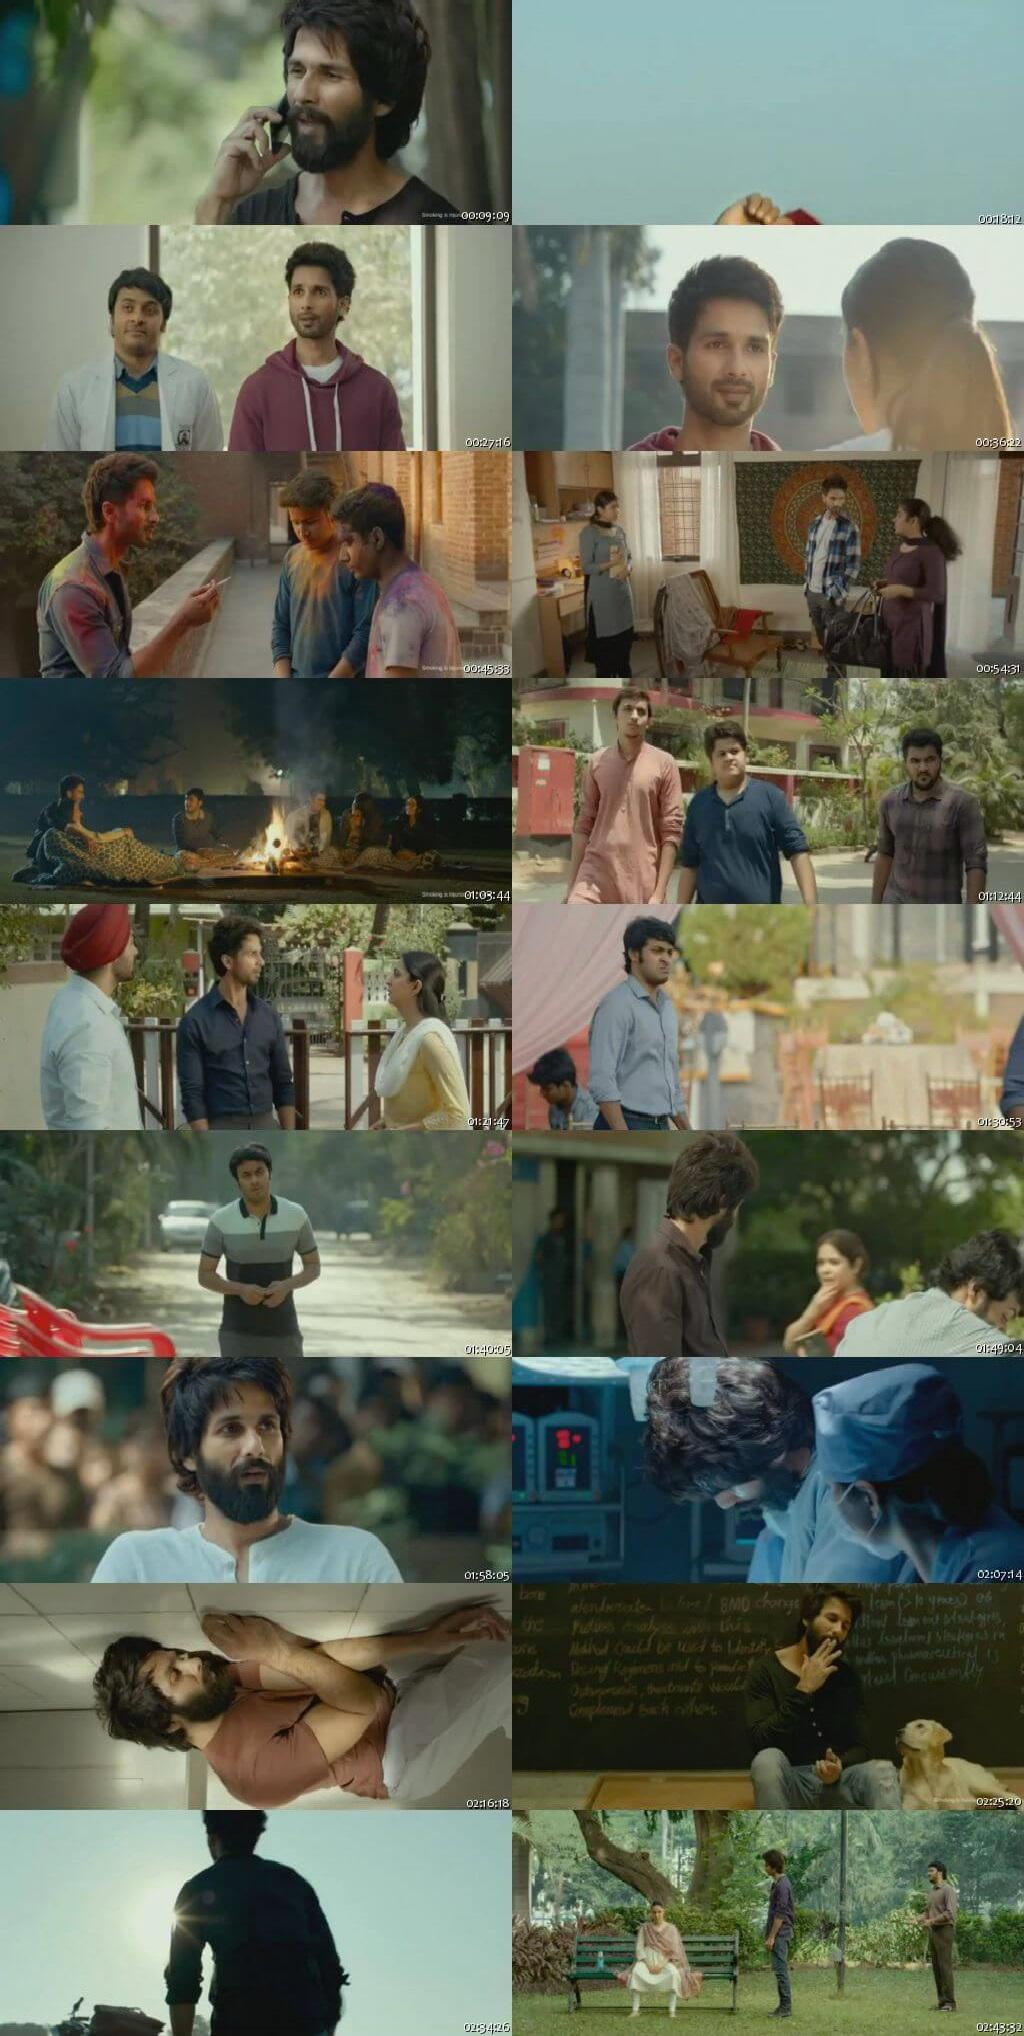 Kabir%2BSingh%2Bhdr Kabir Singh 2019 Full Movie Download 300MB HD 480P Hindi HDRip Free